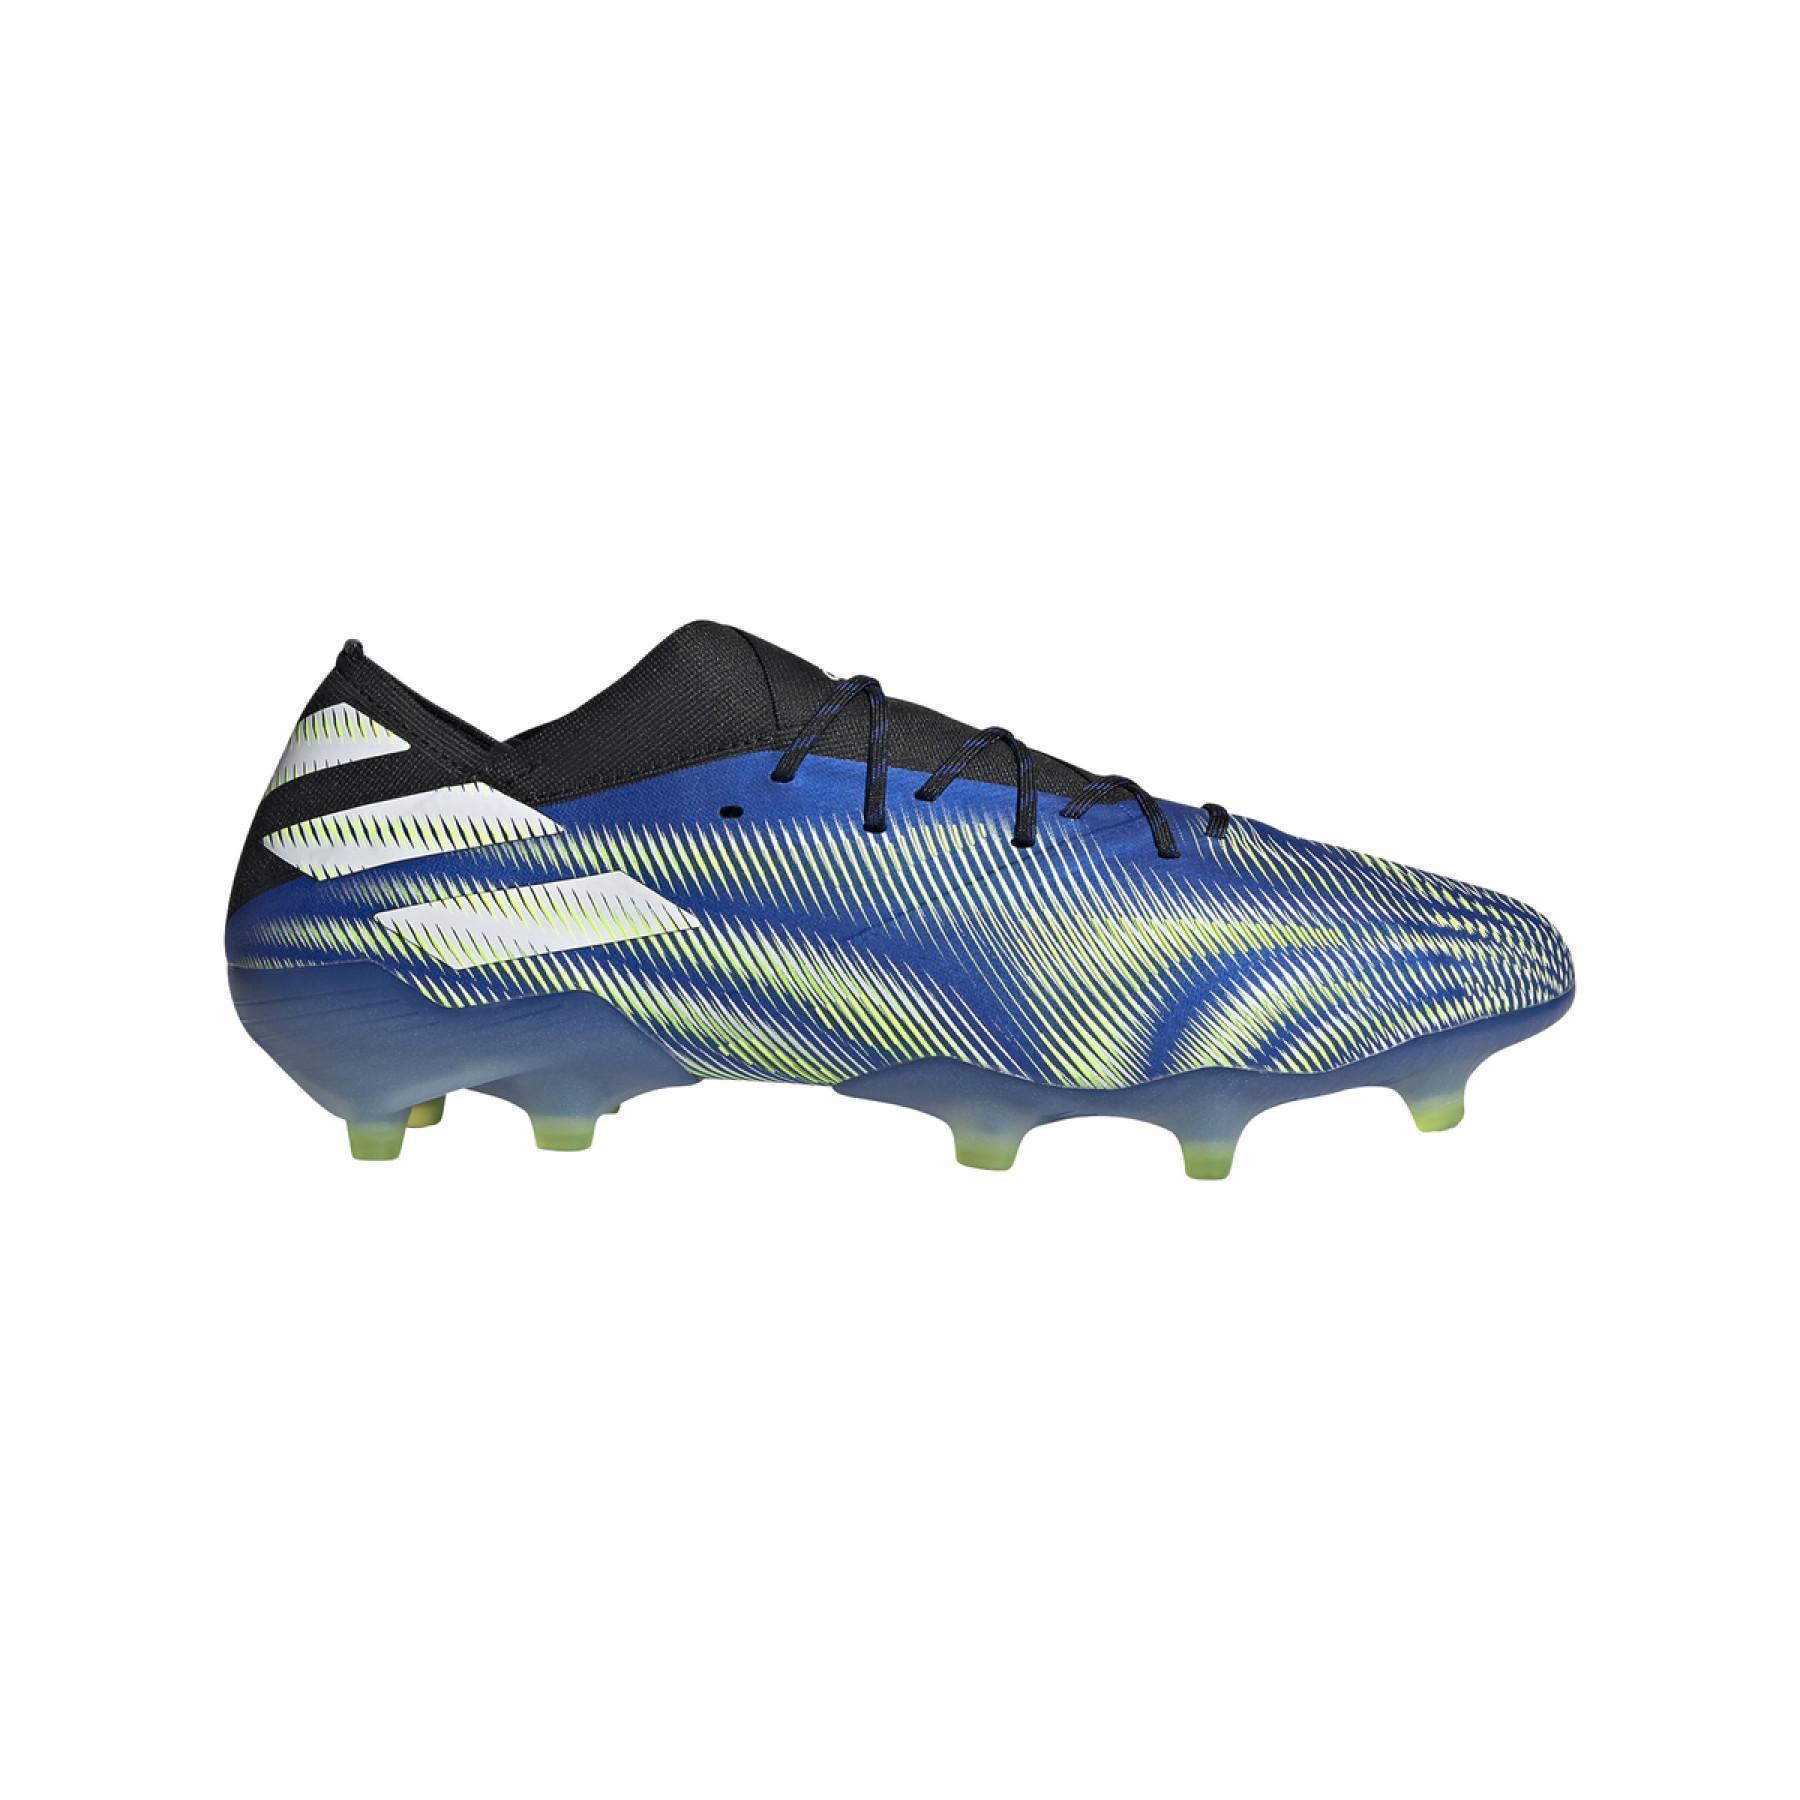 adidas Nemeziz Shoes .1 FG